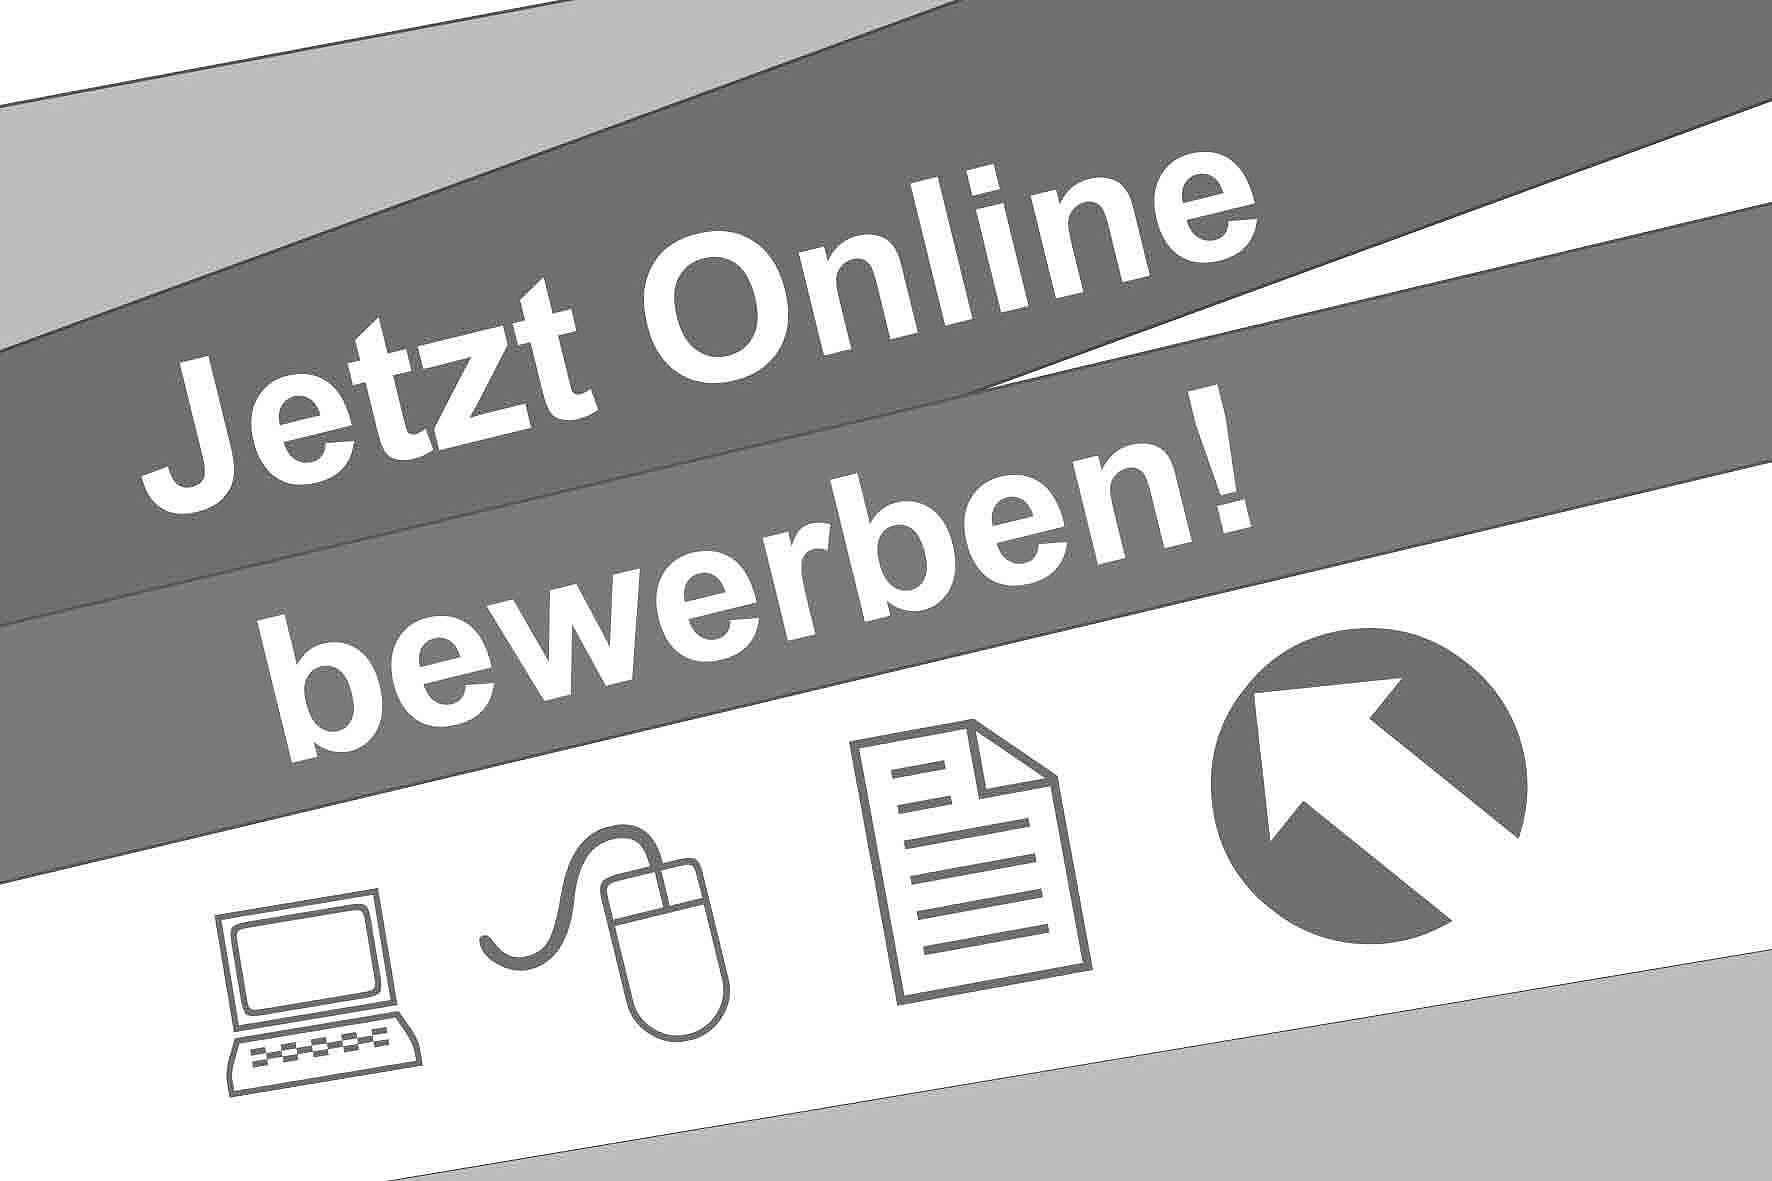 online bewerbung - Audi Bewerben